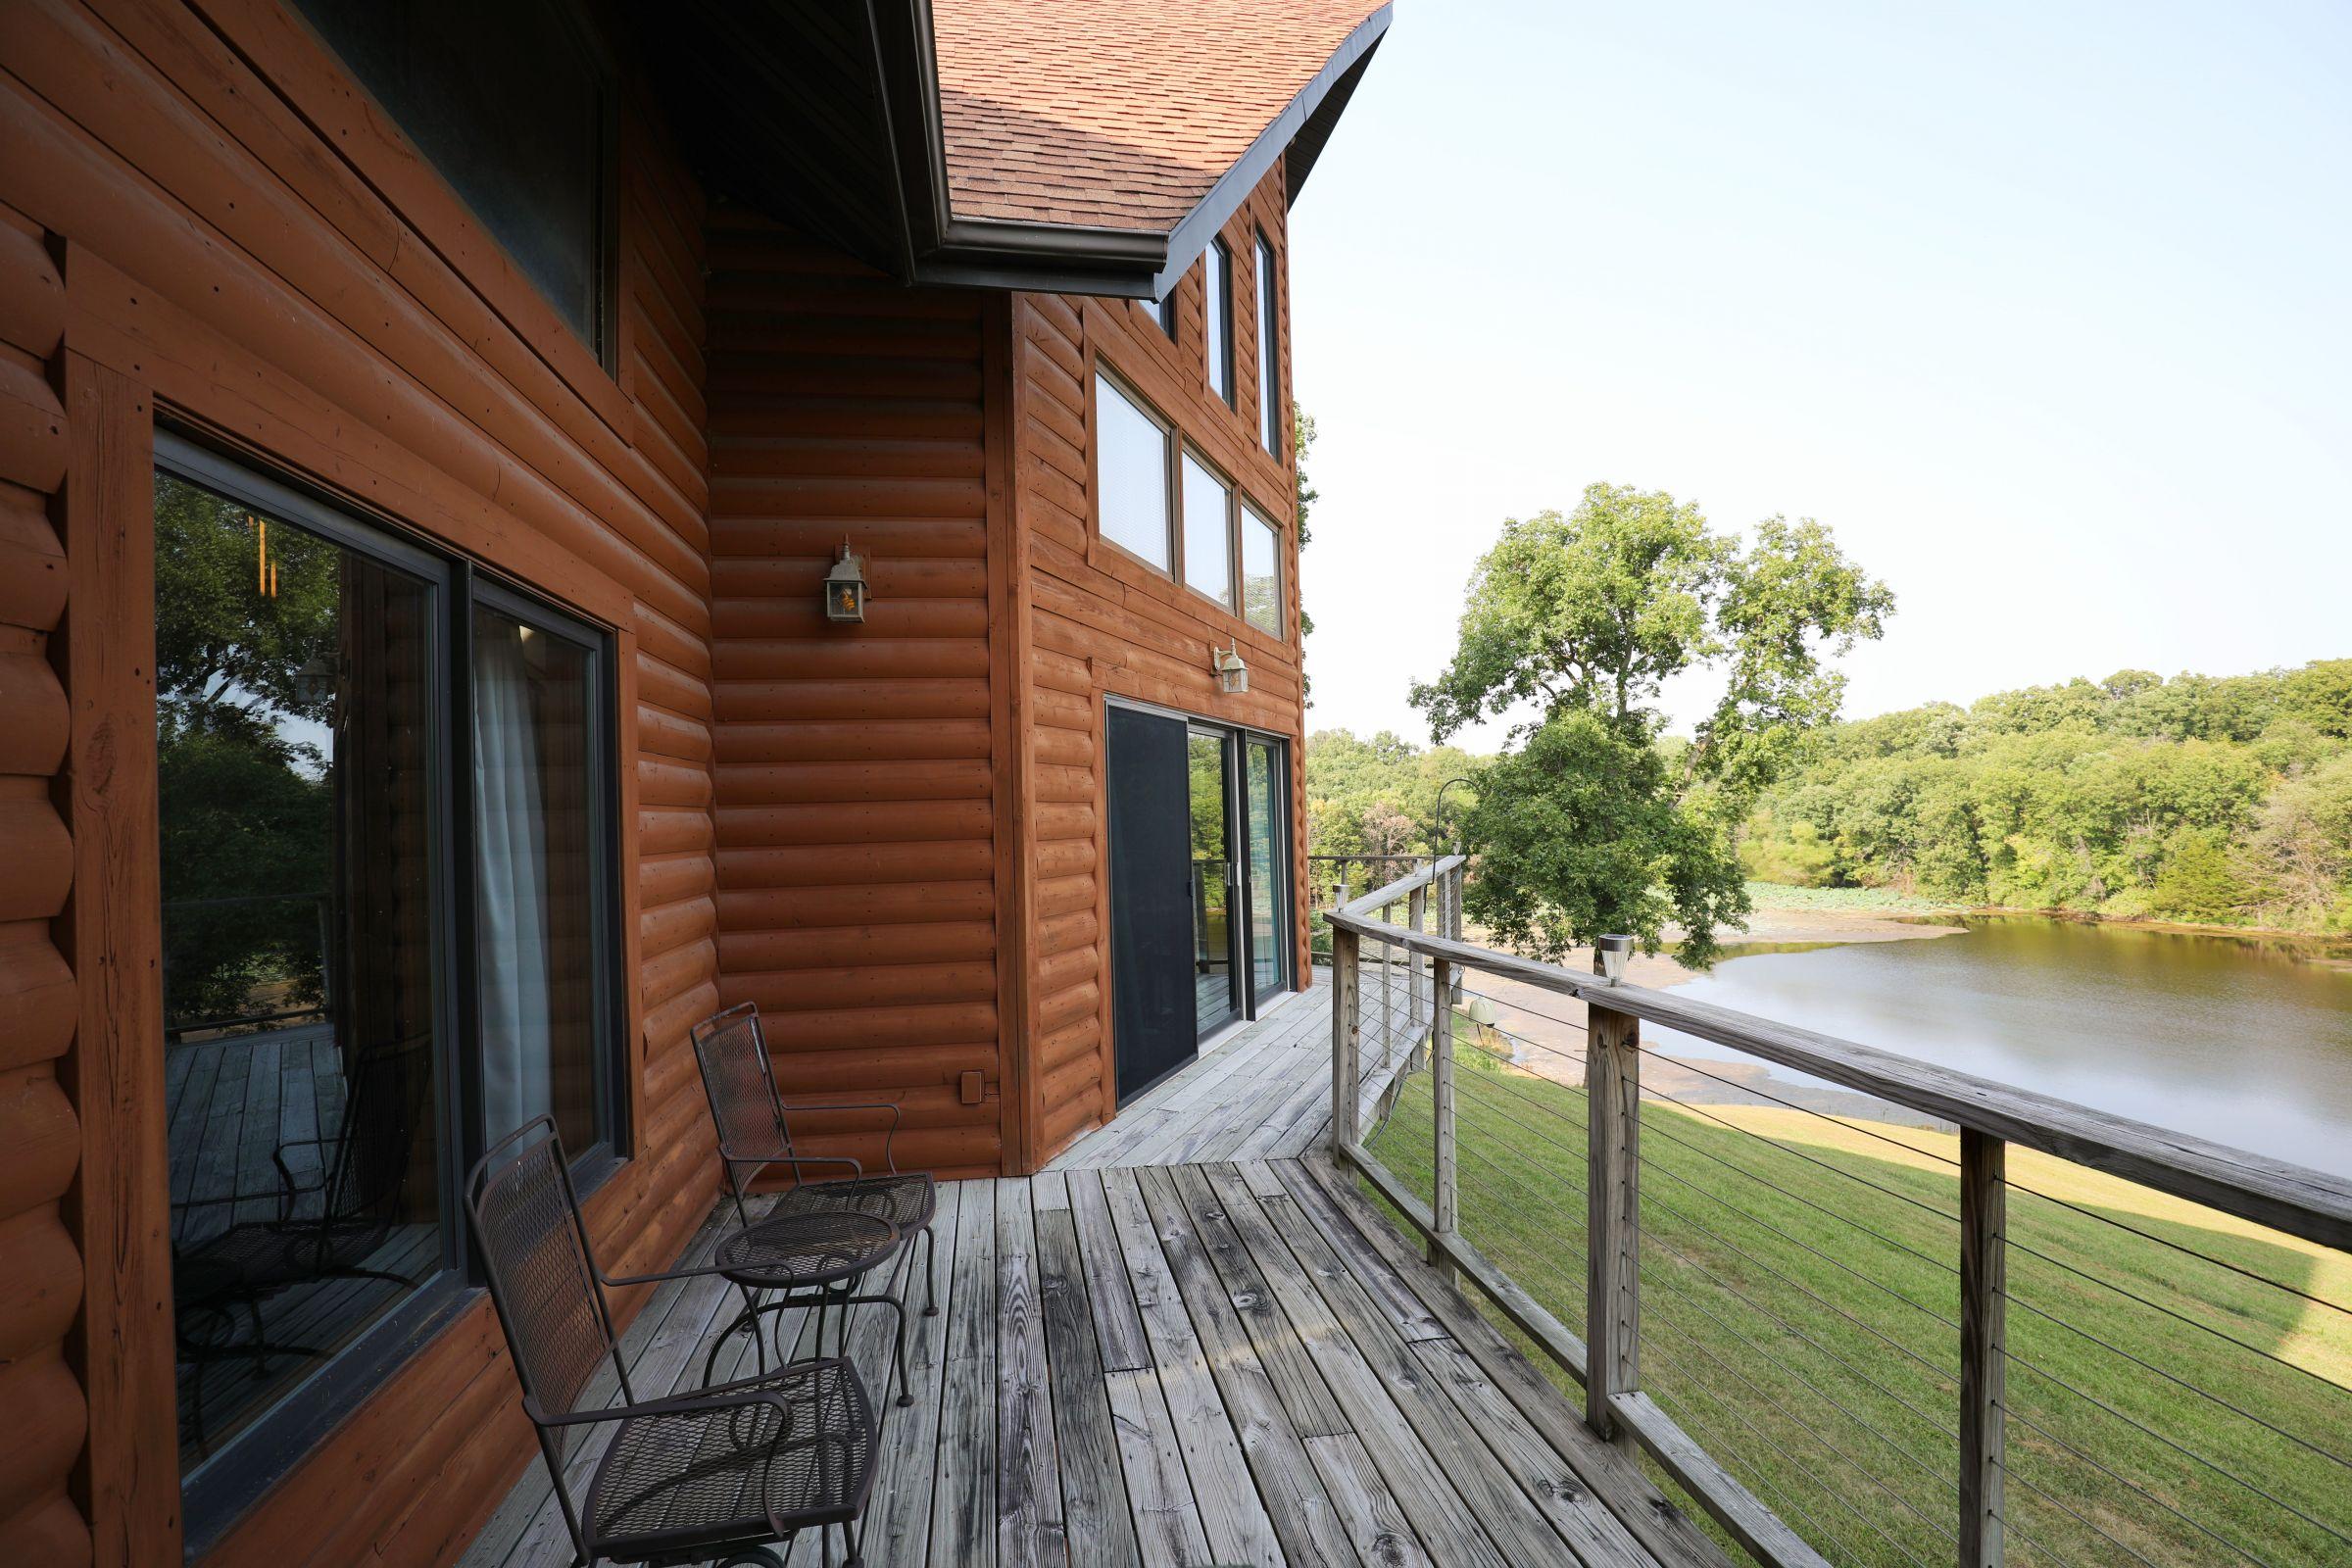 land-lee-county-iowa-328-acres-listing-number-15137-2-2020-08-27-174652.jpg